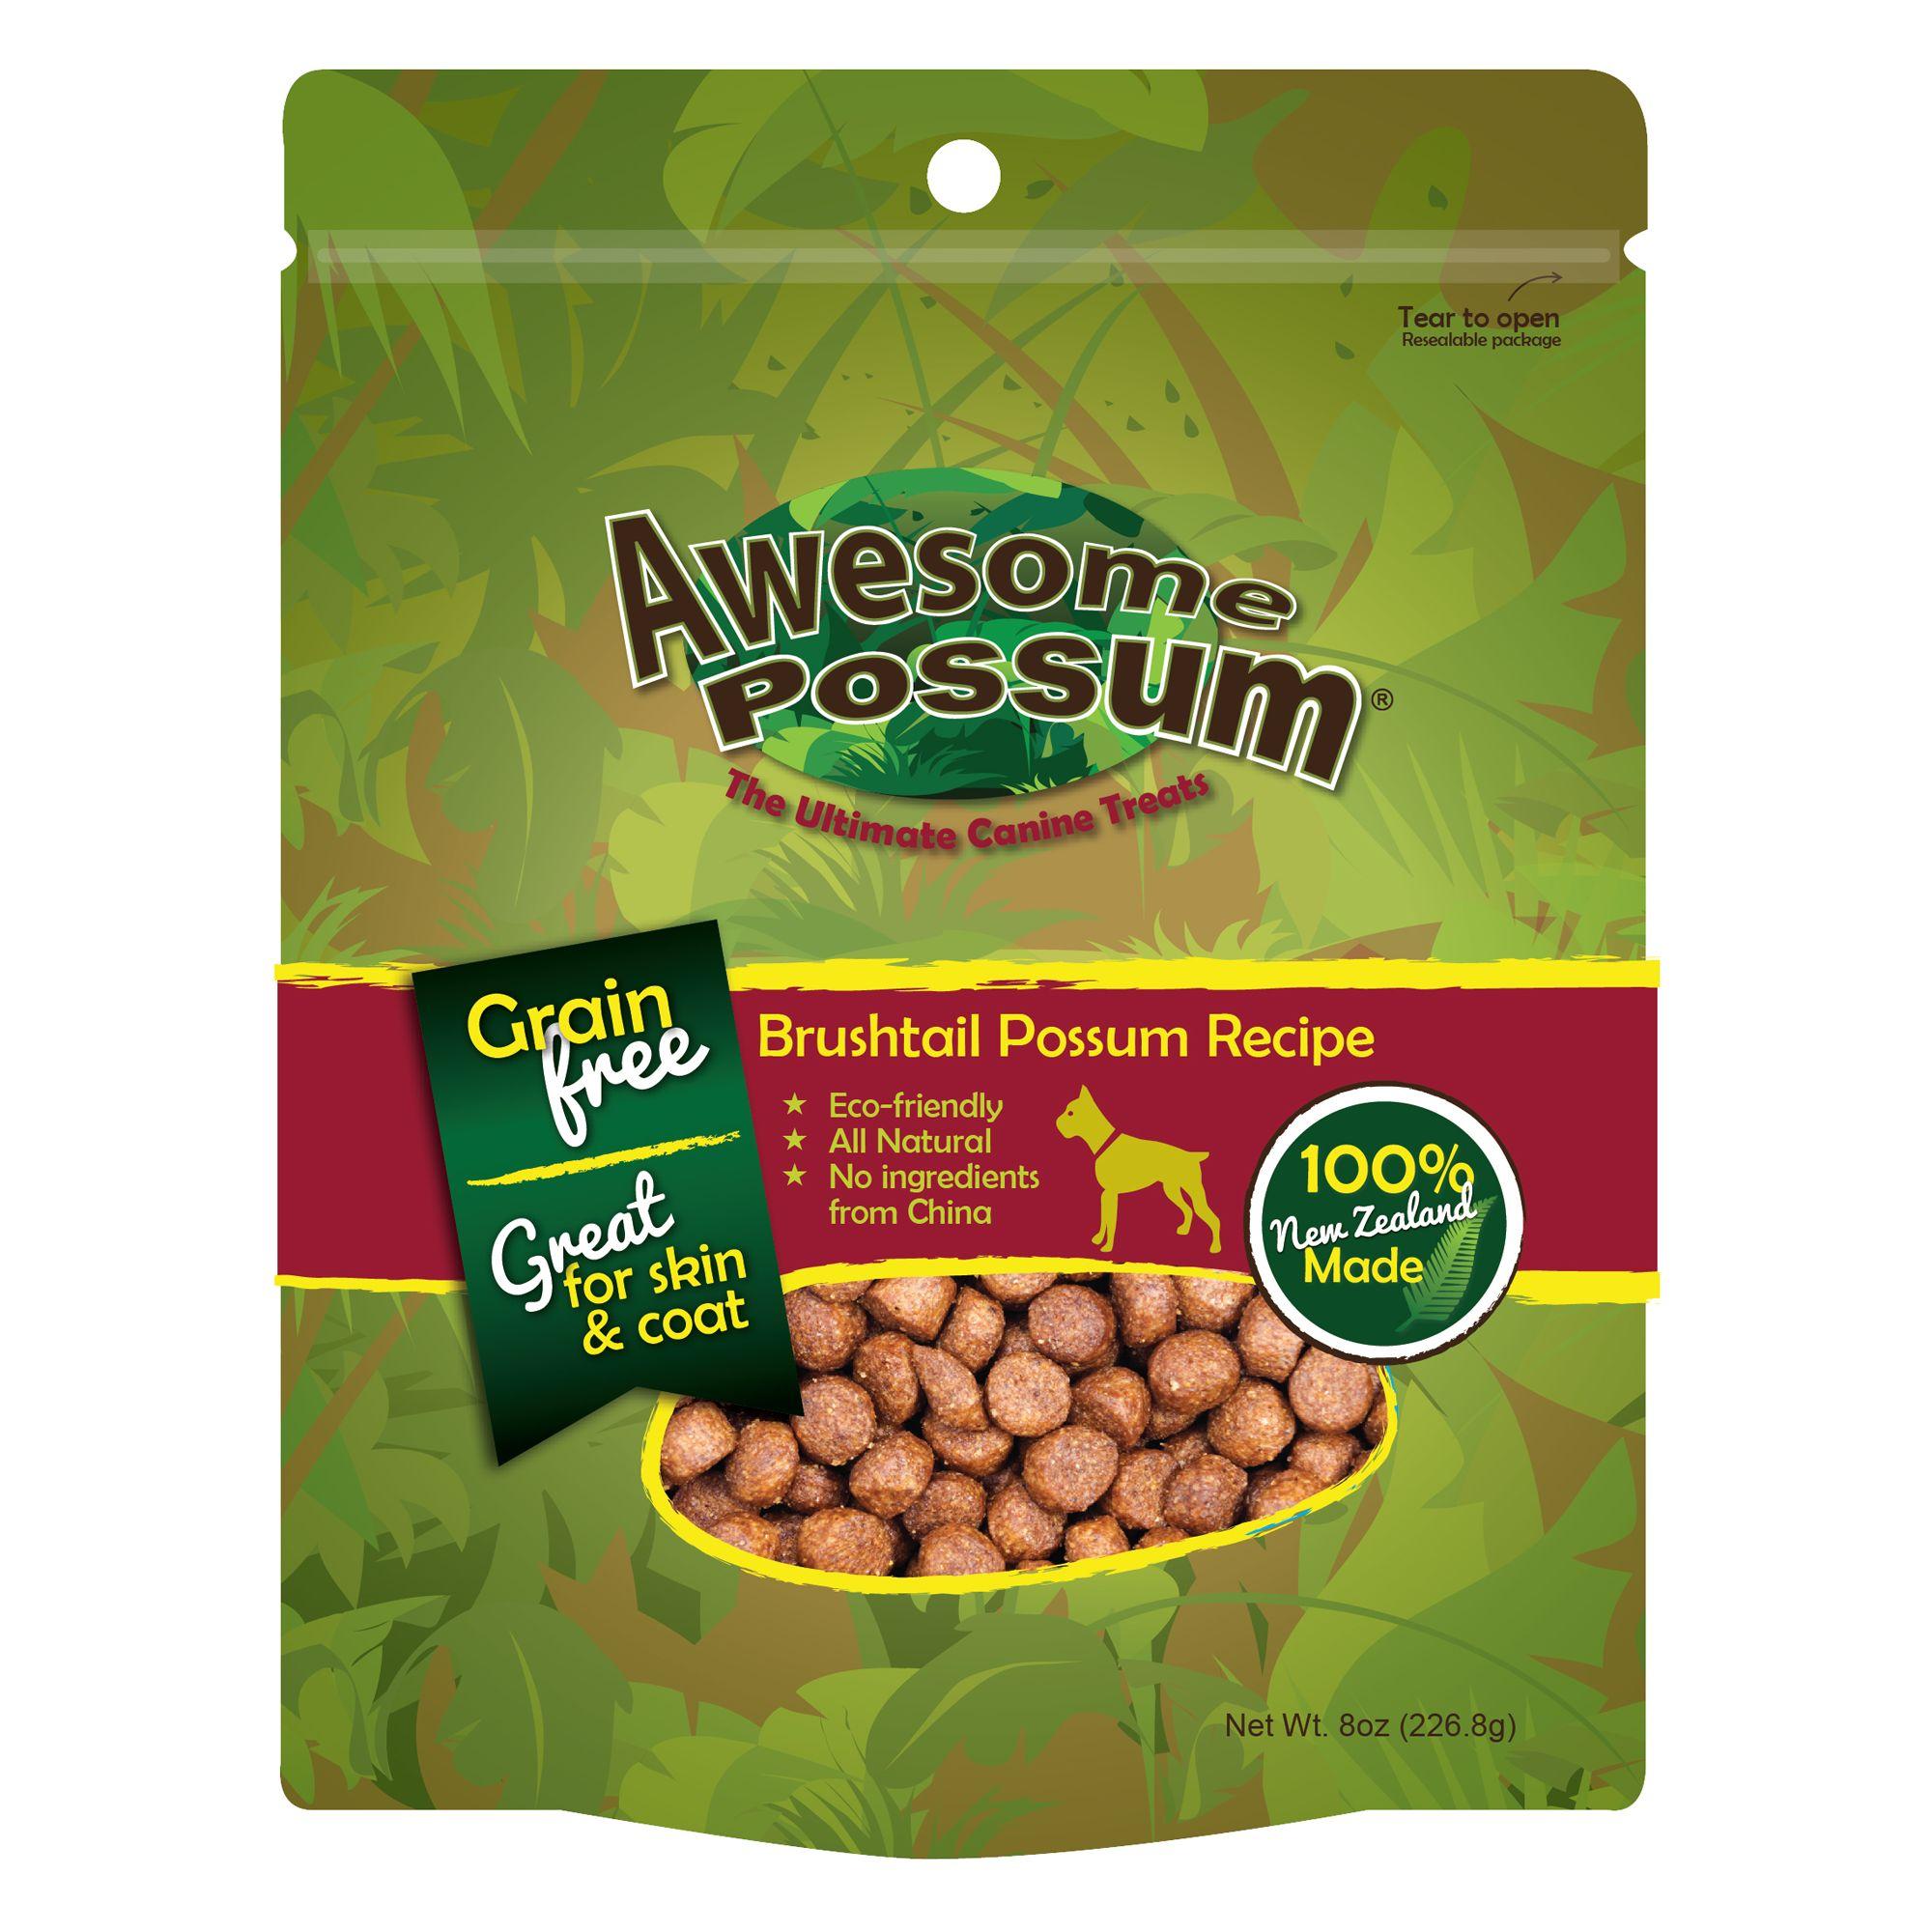 Awesome Possum Dog Treat Natural Grain Free Brushtail Possum Recipe Size 8 Oz